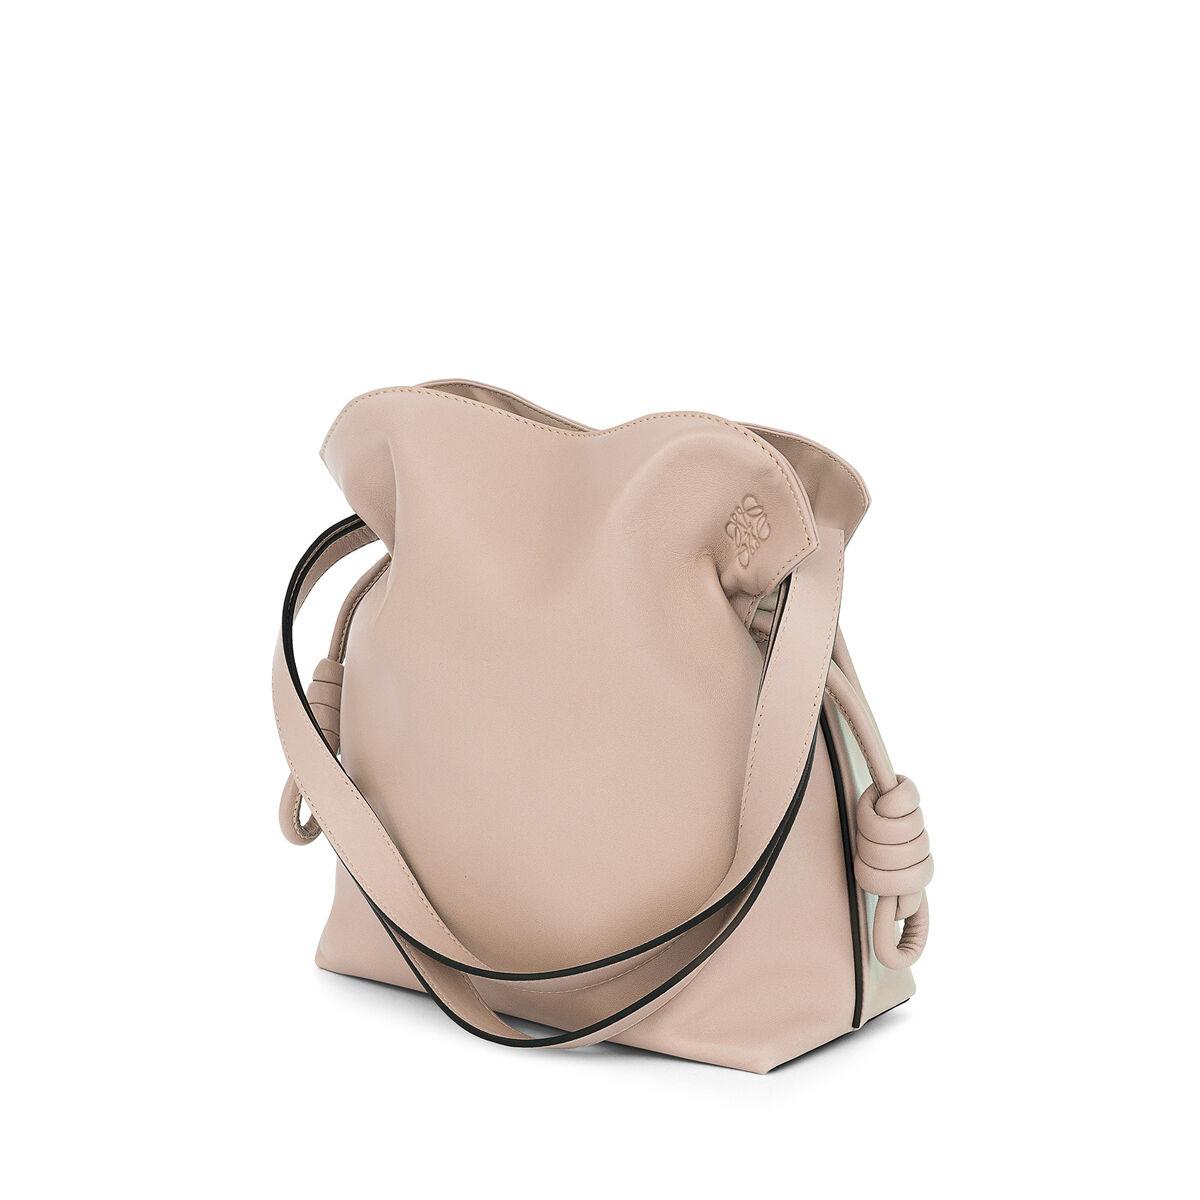 LOEWE Flamenco Knot Small Bag 粉末灰 all